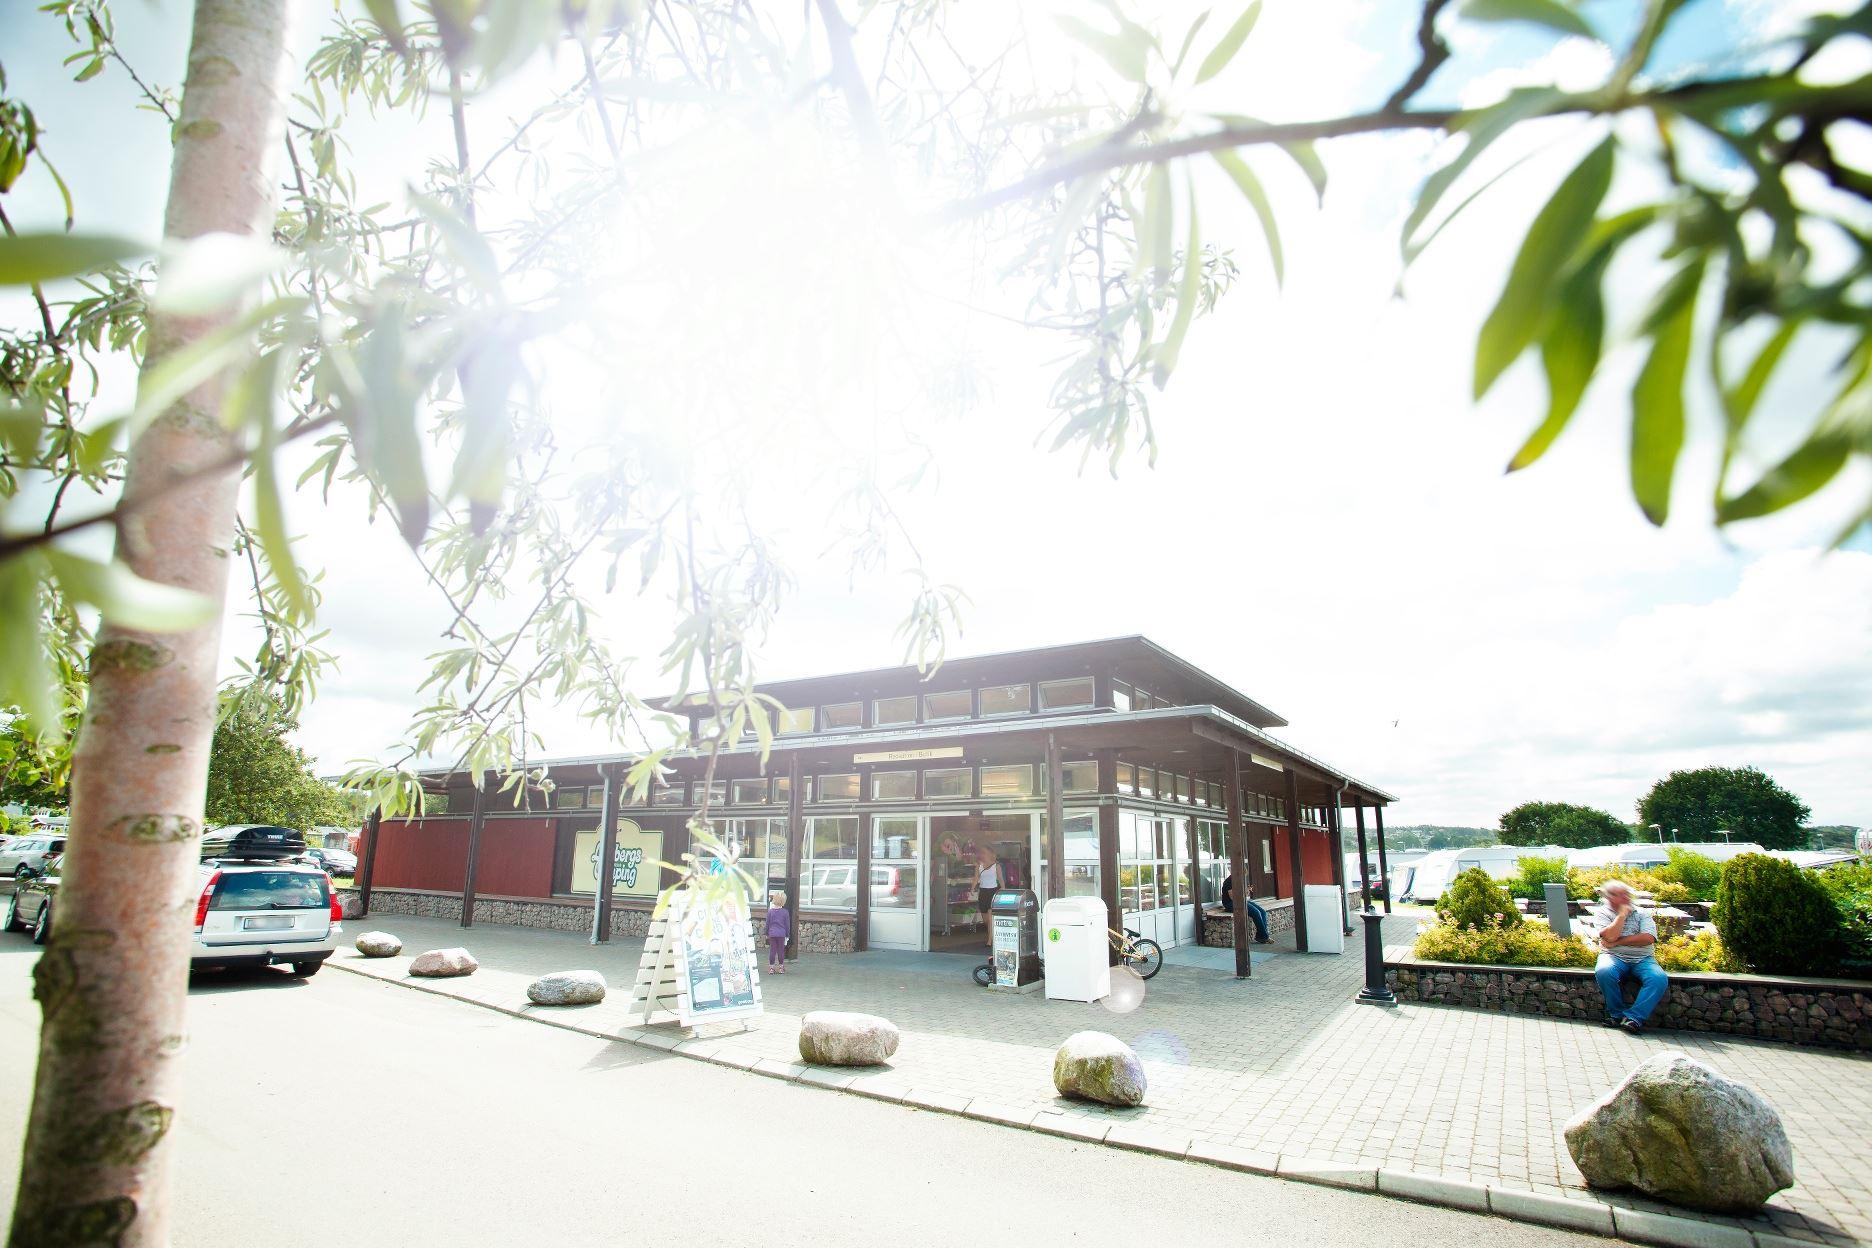 Lisebergs Camping Askim Strand/Hostel